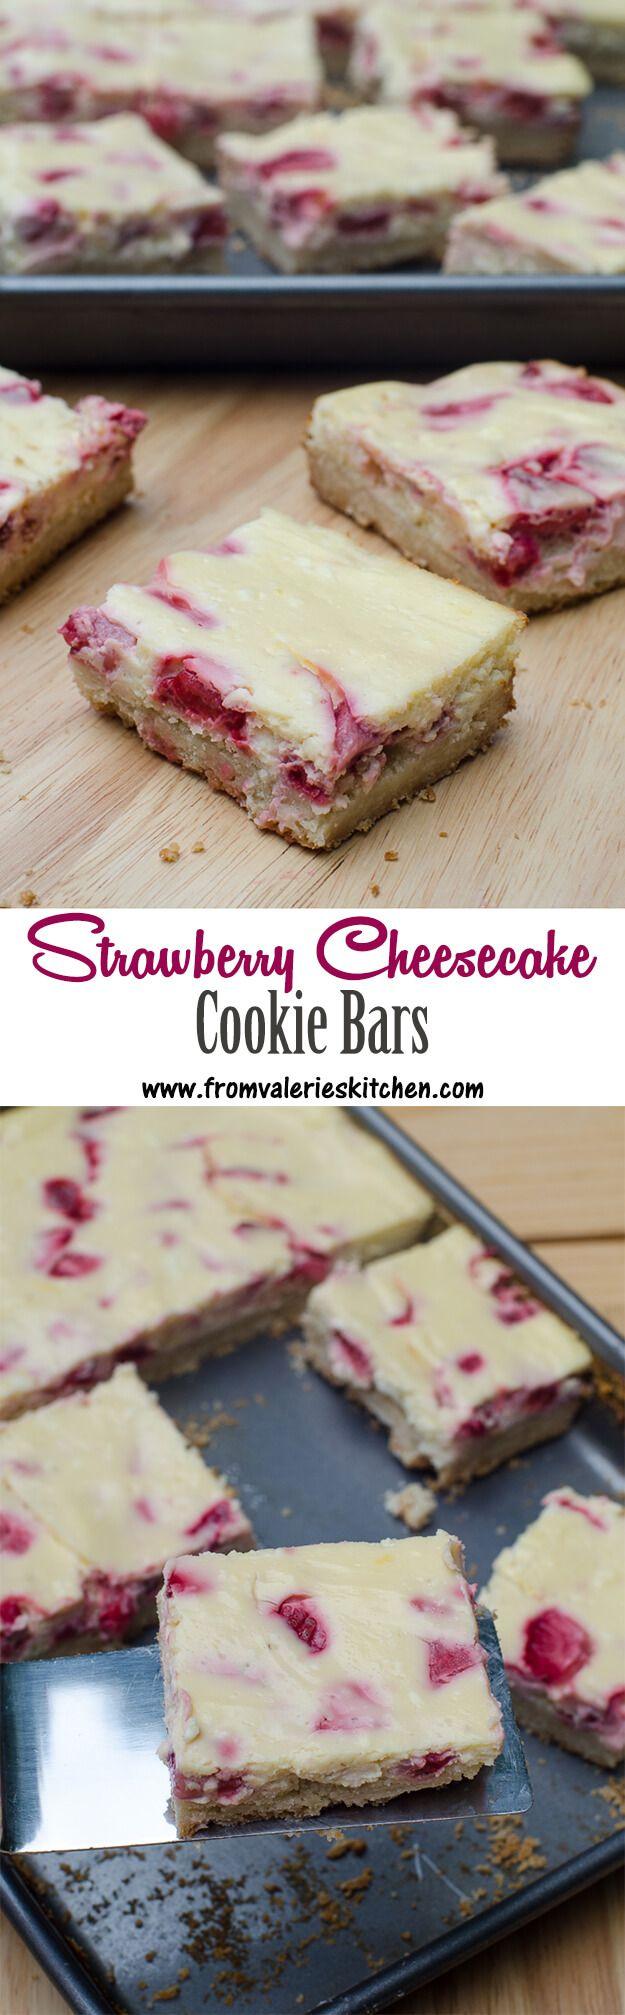 Fresh strawberry cheesecake baked over a shortbread cookie crust! ~ http://www.fromvalerieskitchen.com